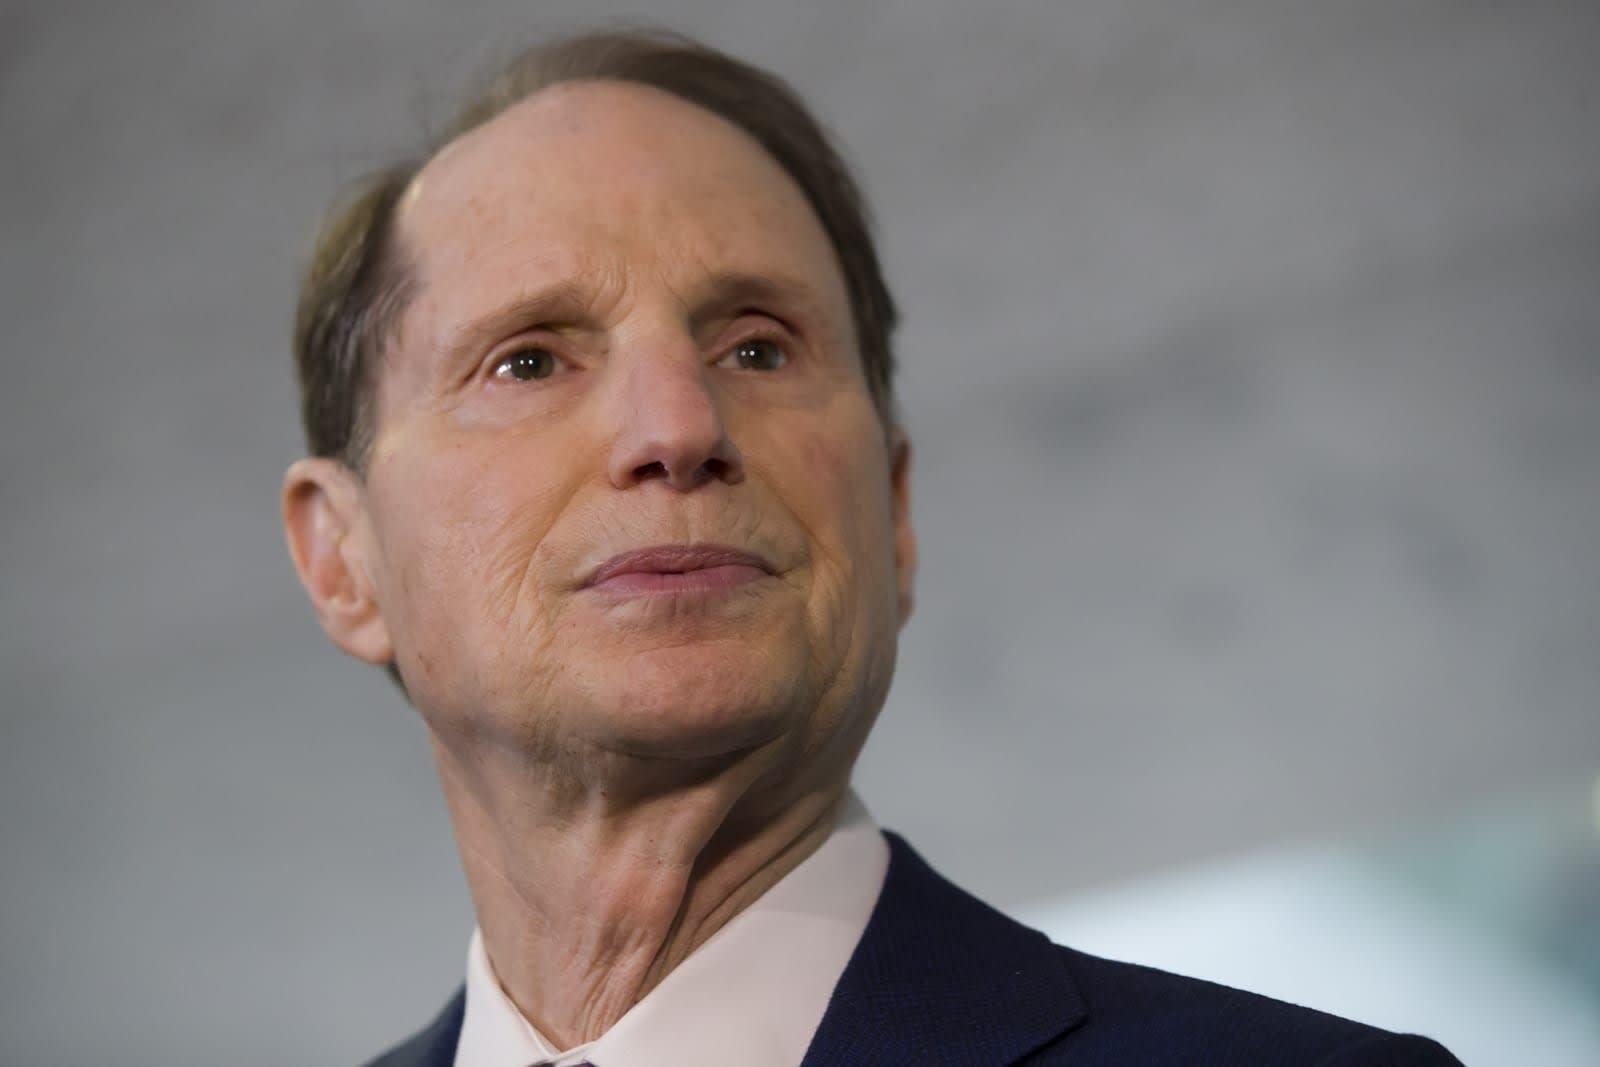 Senator asks FTC to investigate questionable ad blocking practices